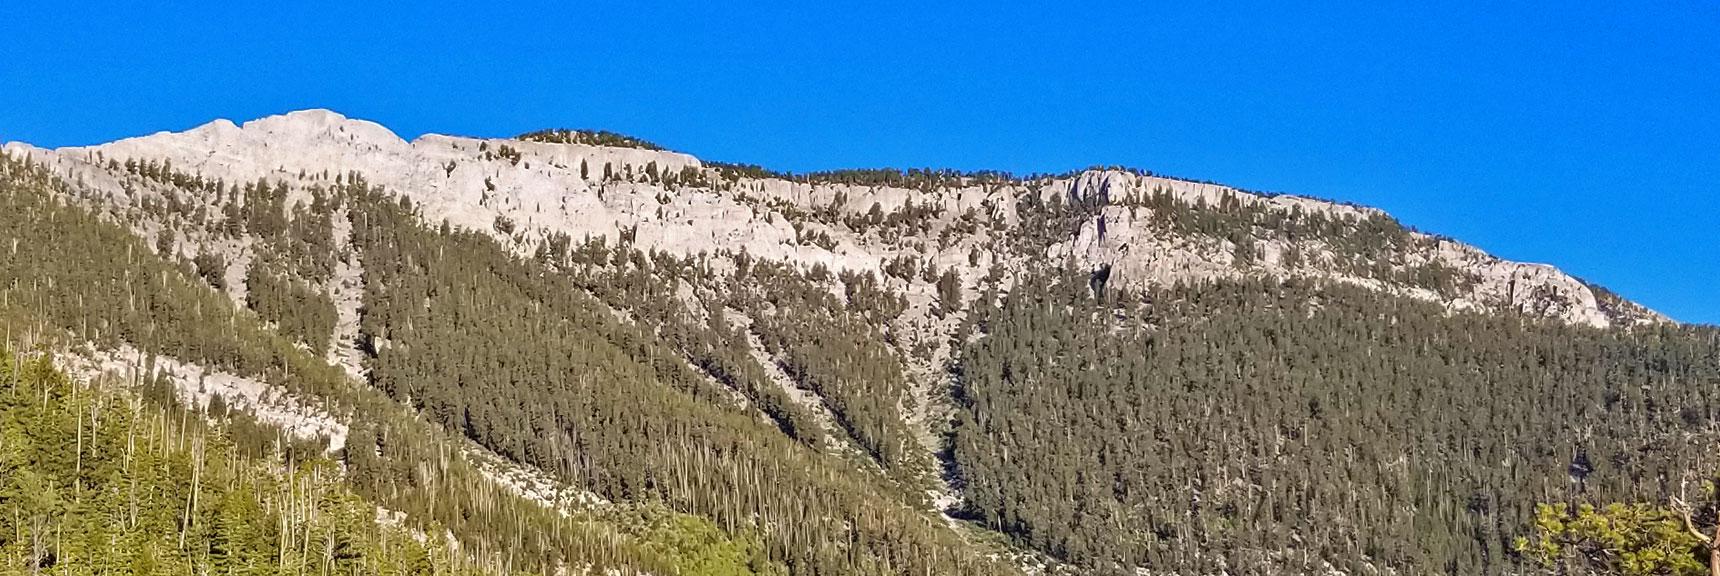 Mummy Mountain Viewed from North Loop Trail Plateau   Mummy Mountain Northeast Approach Wilderness Navigation, Nevada